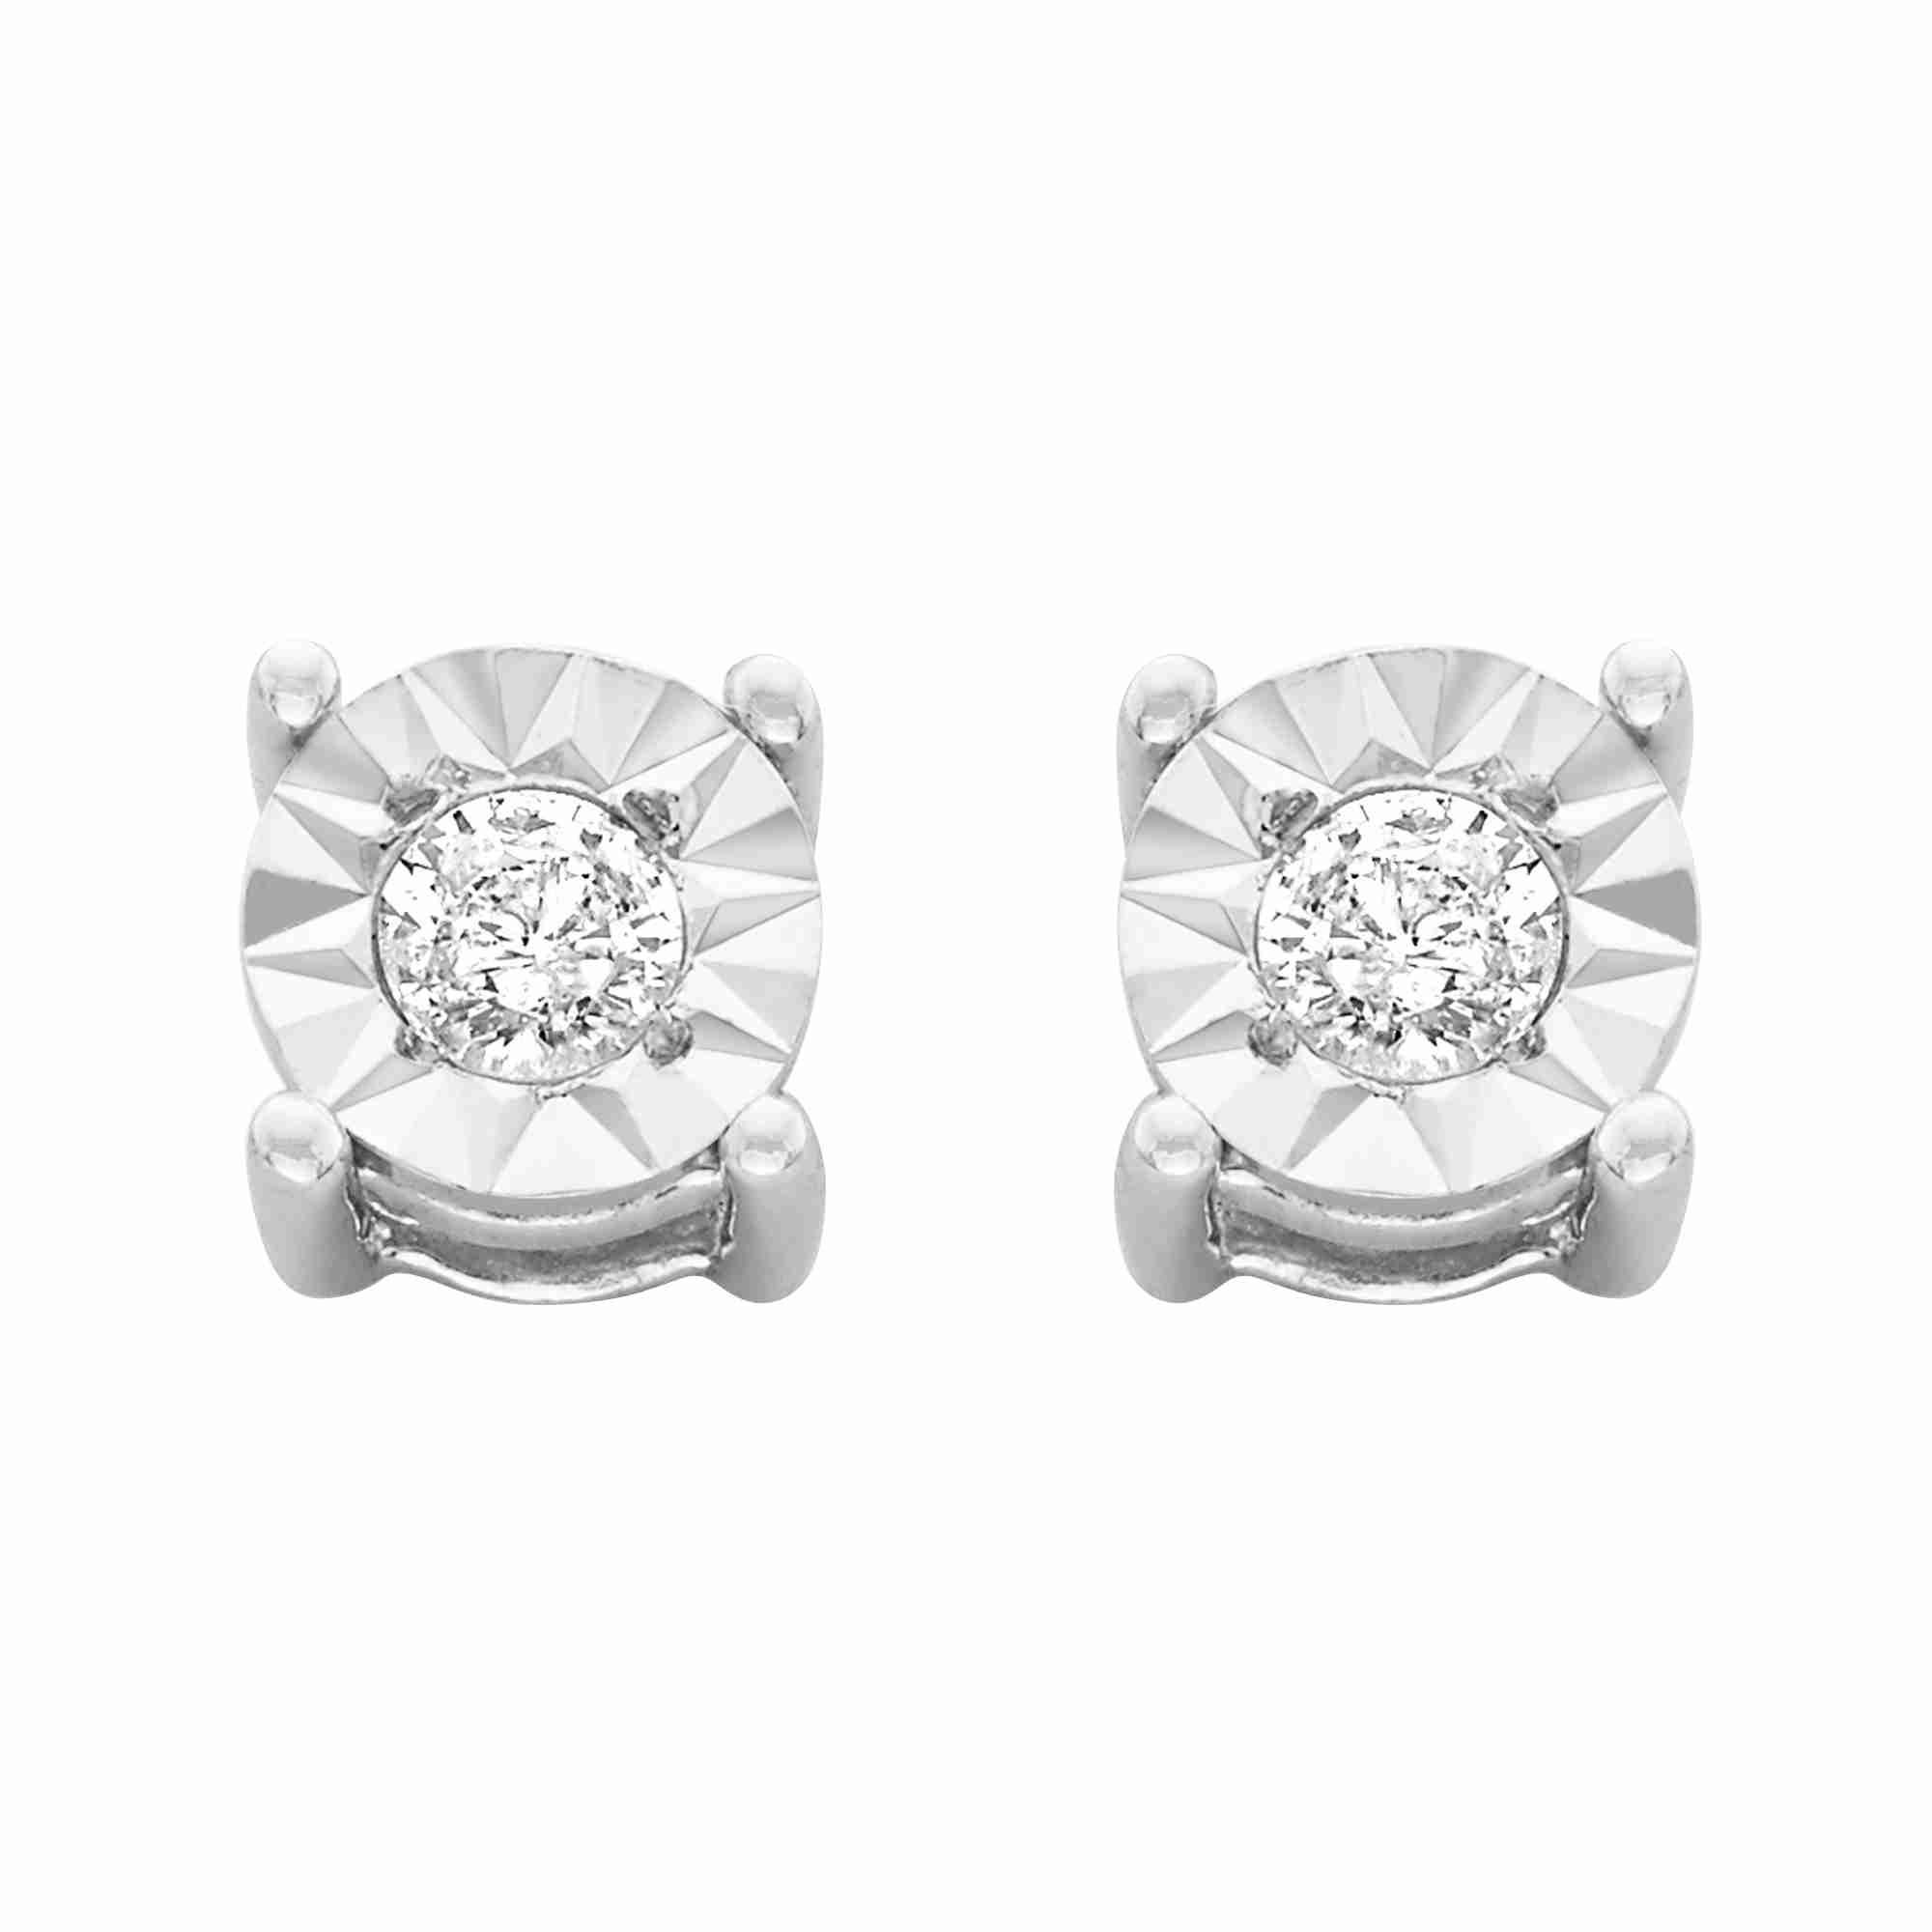 diamond-earrings with cash back rebate